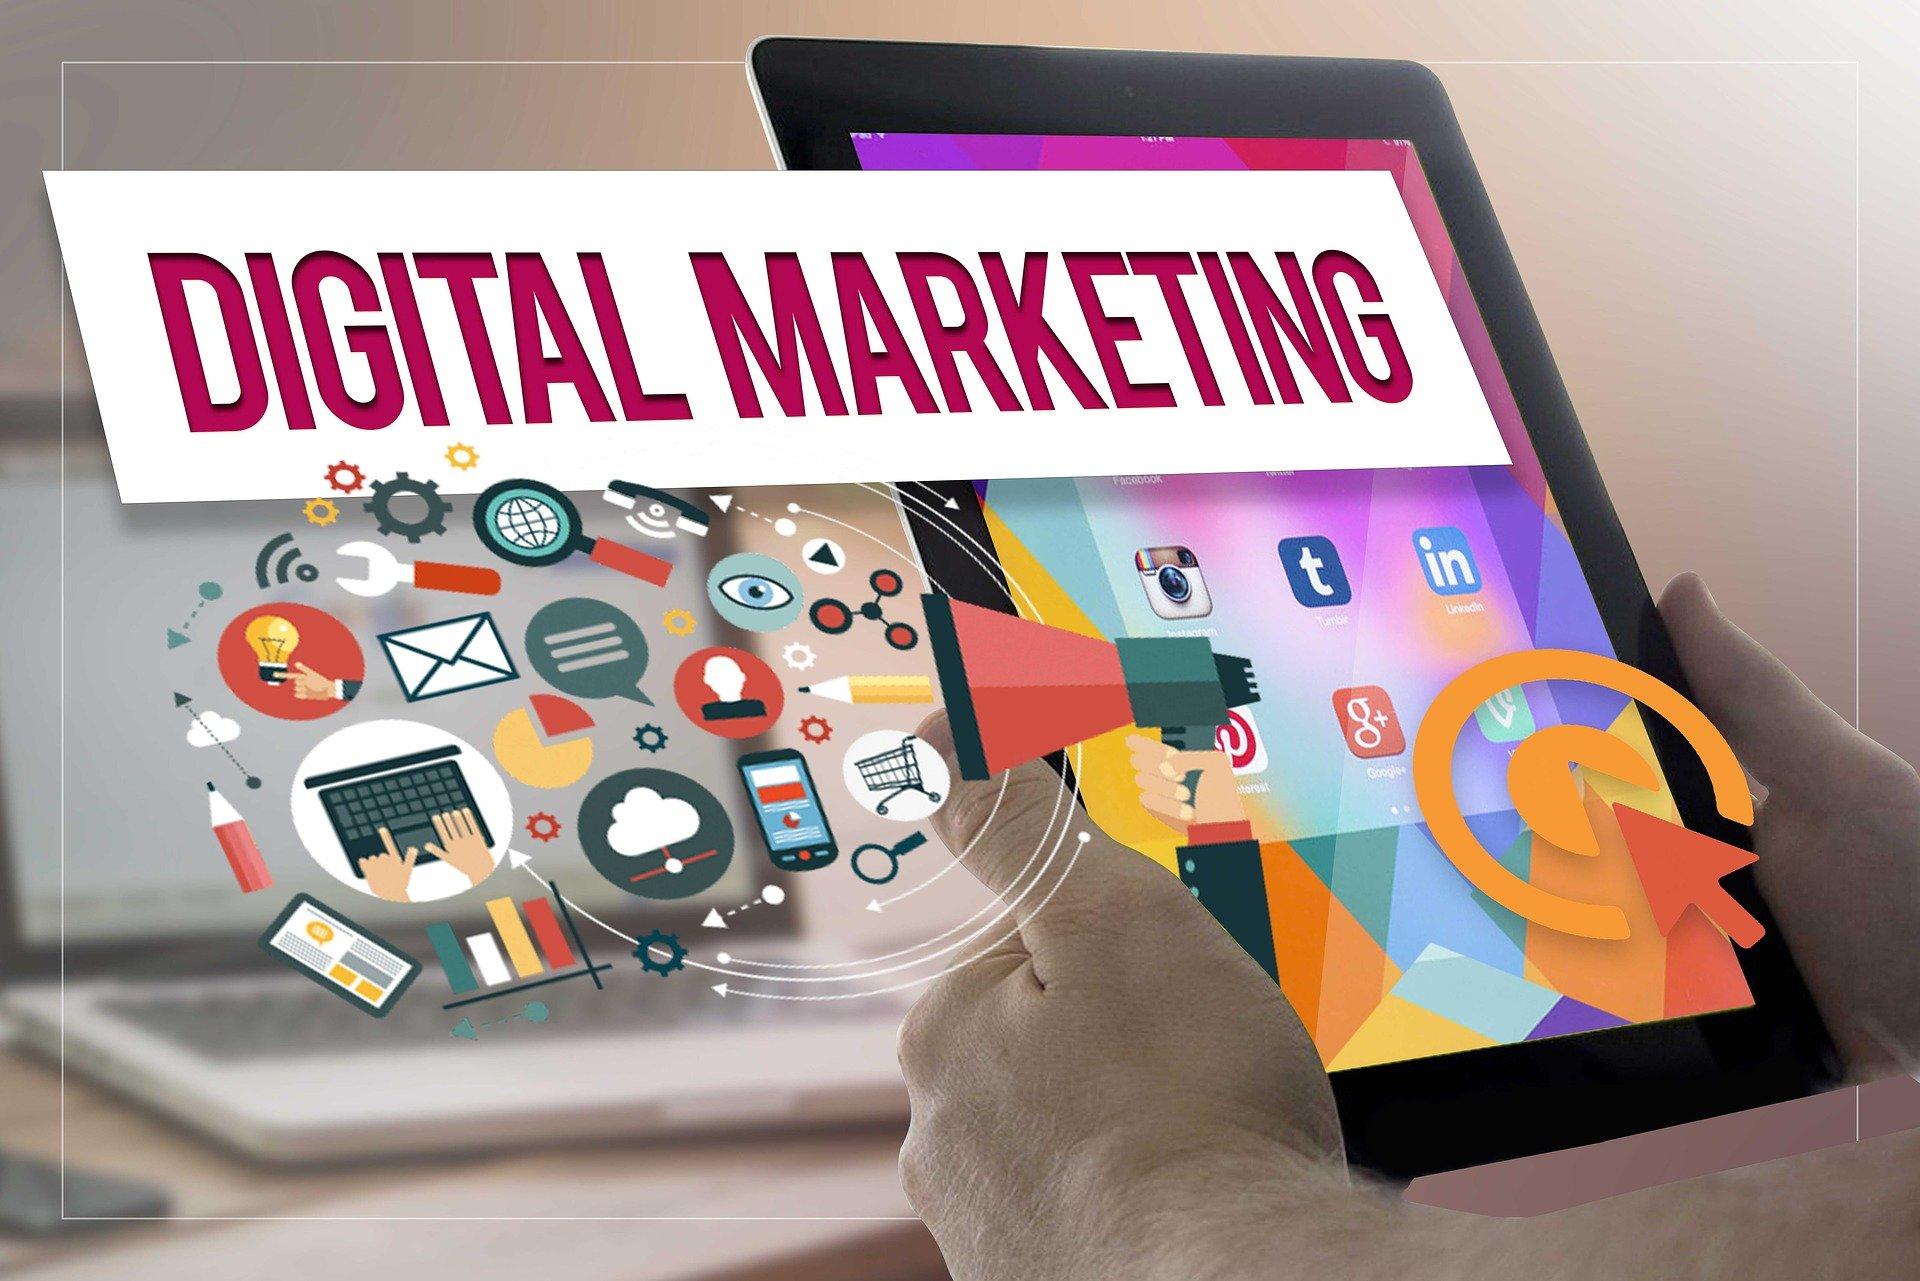 Google Digital Marketing Training Course